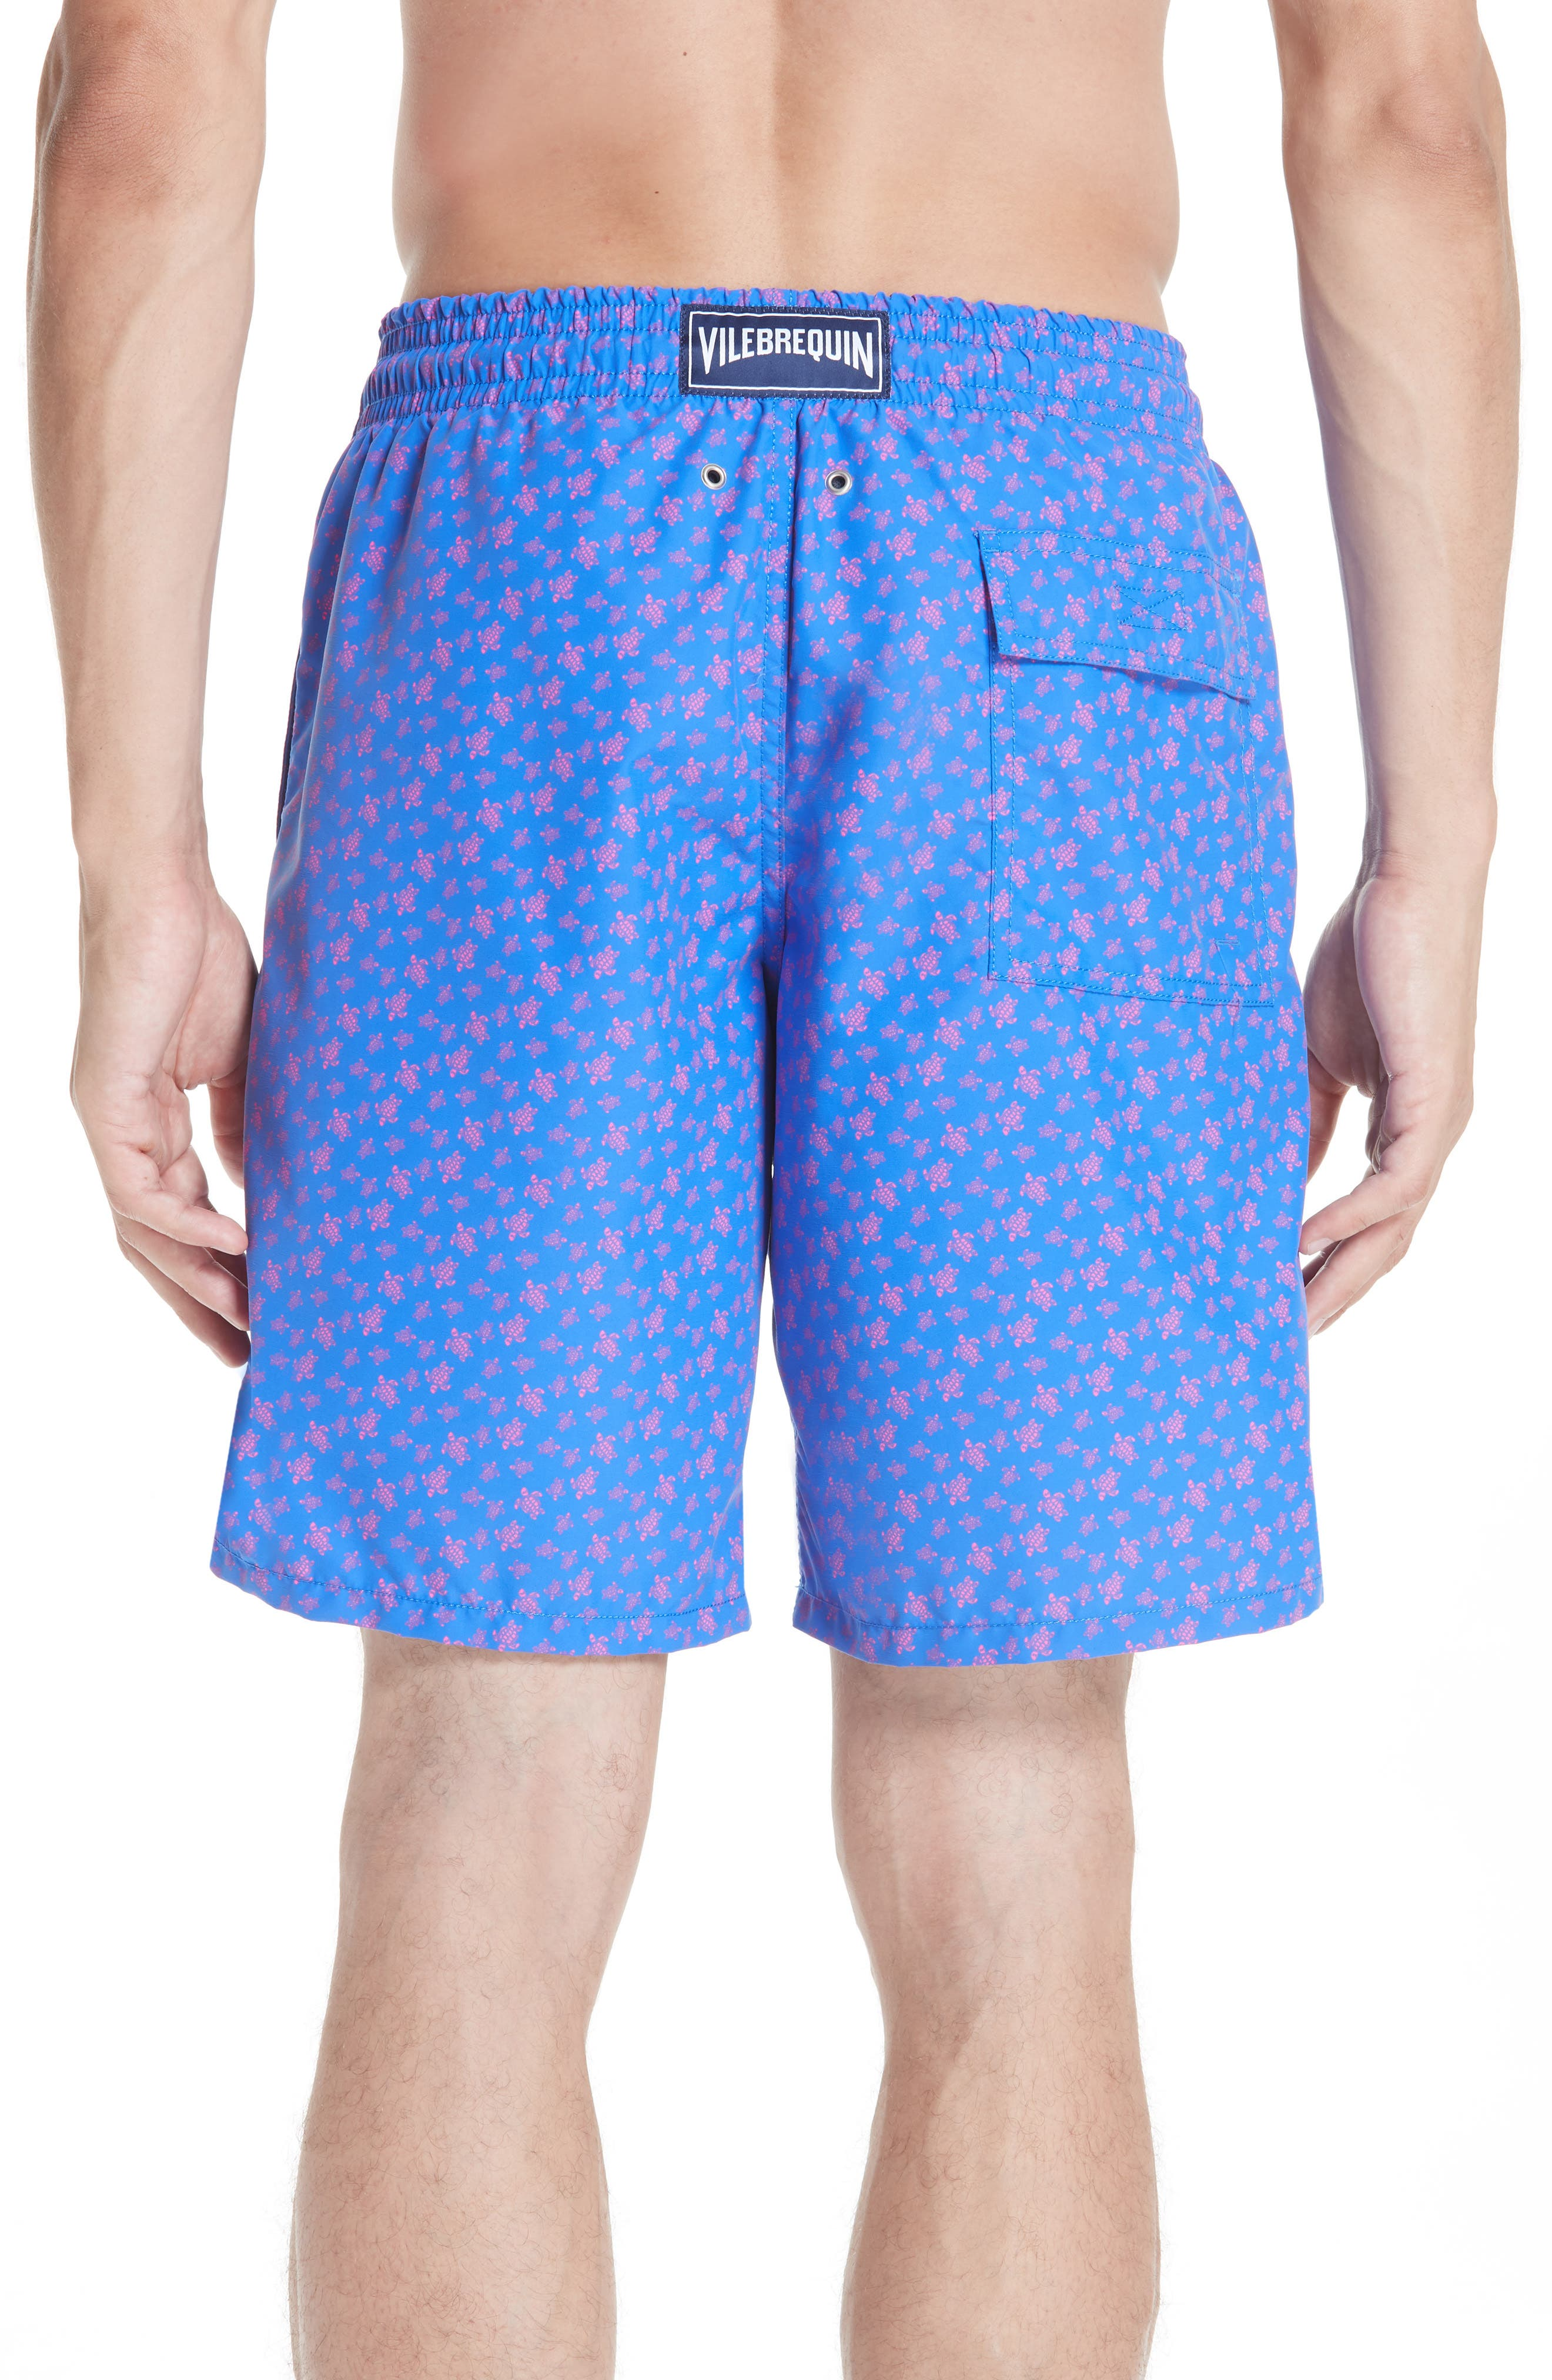 VILEBREQUIN,                             Micro Ronde Turtle Print Swim Trunks,                             Alternate thumbnail 2, color,                             BLUE